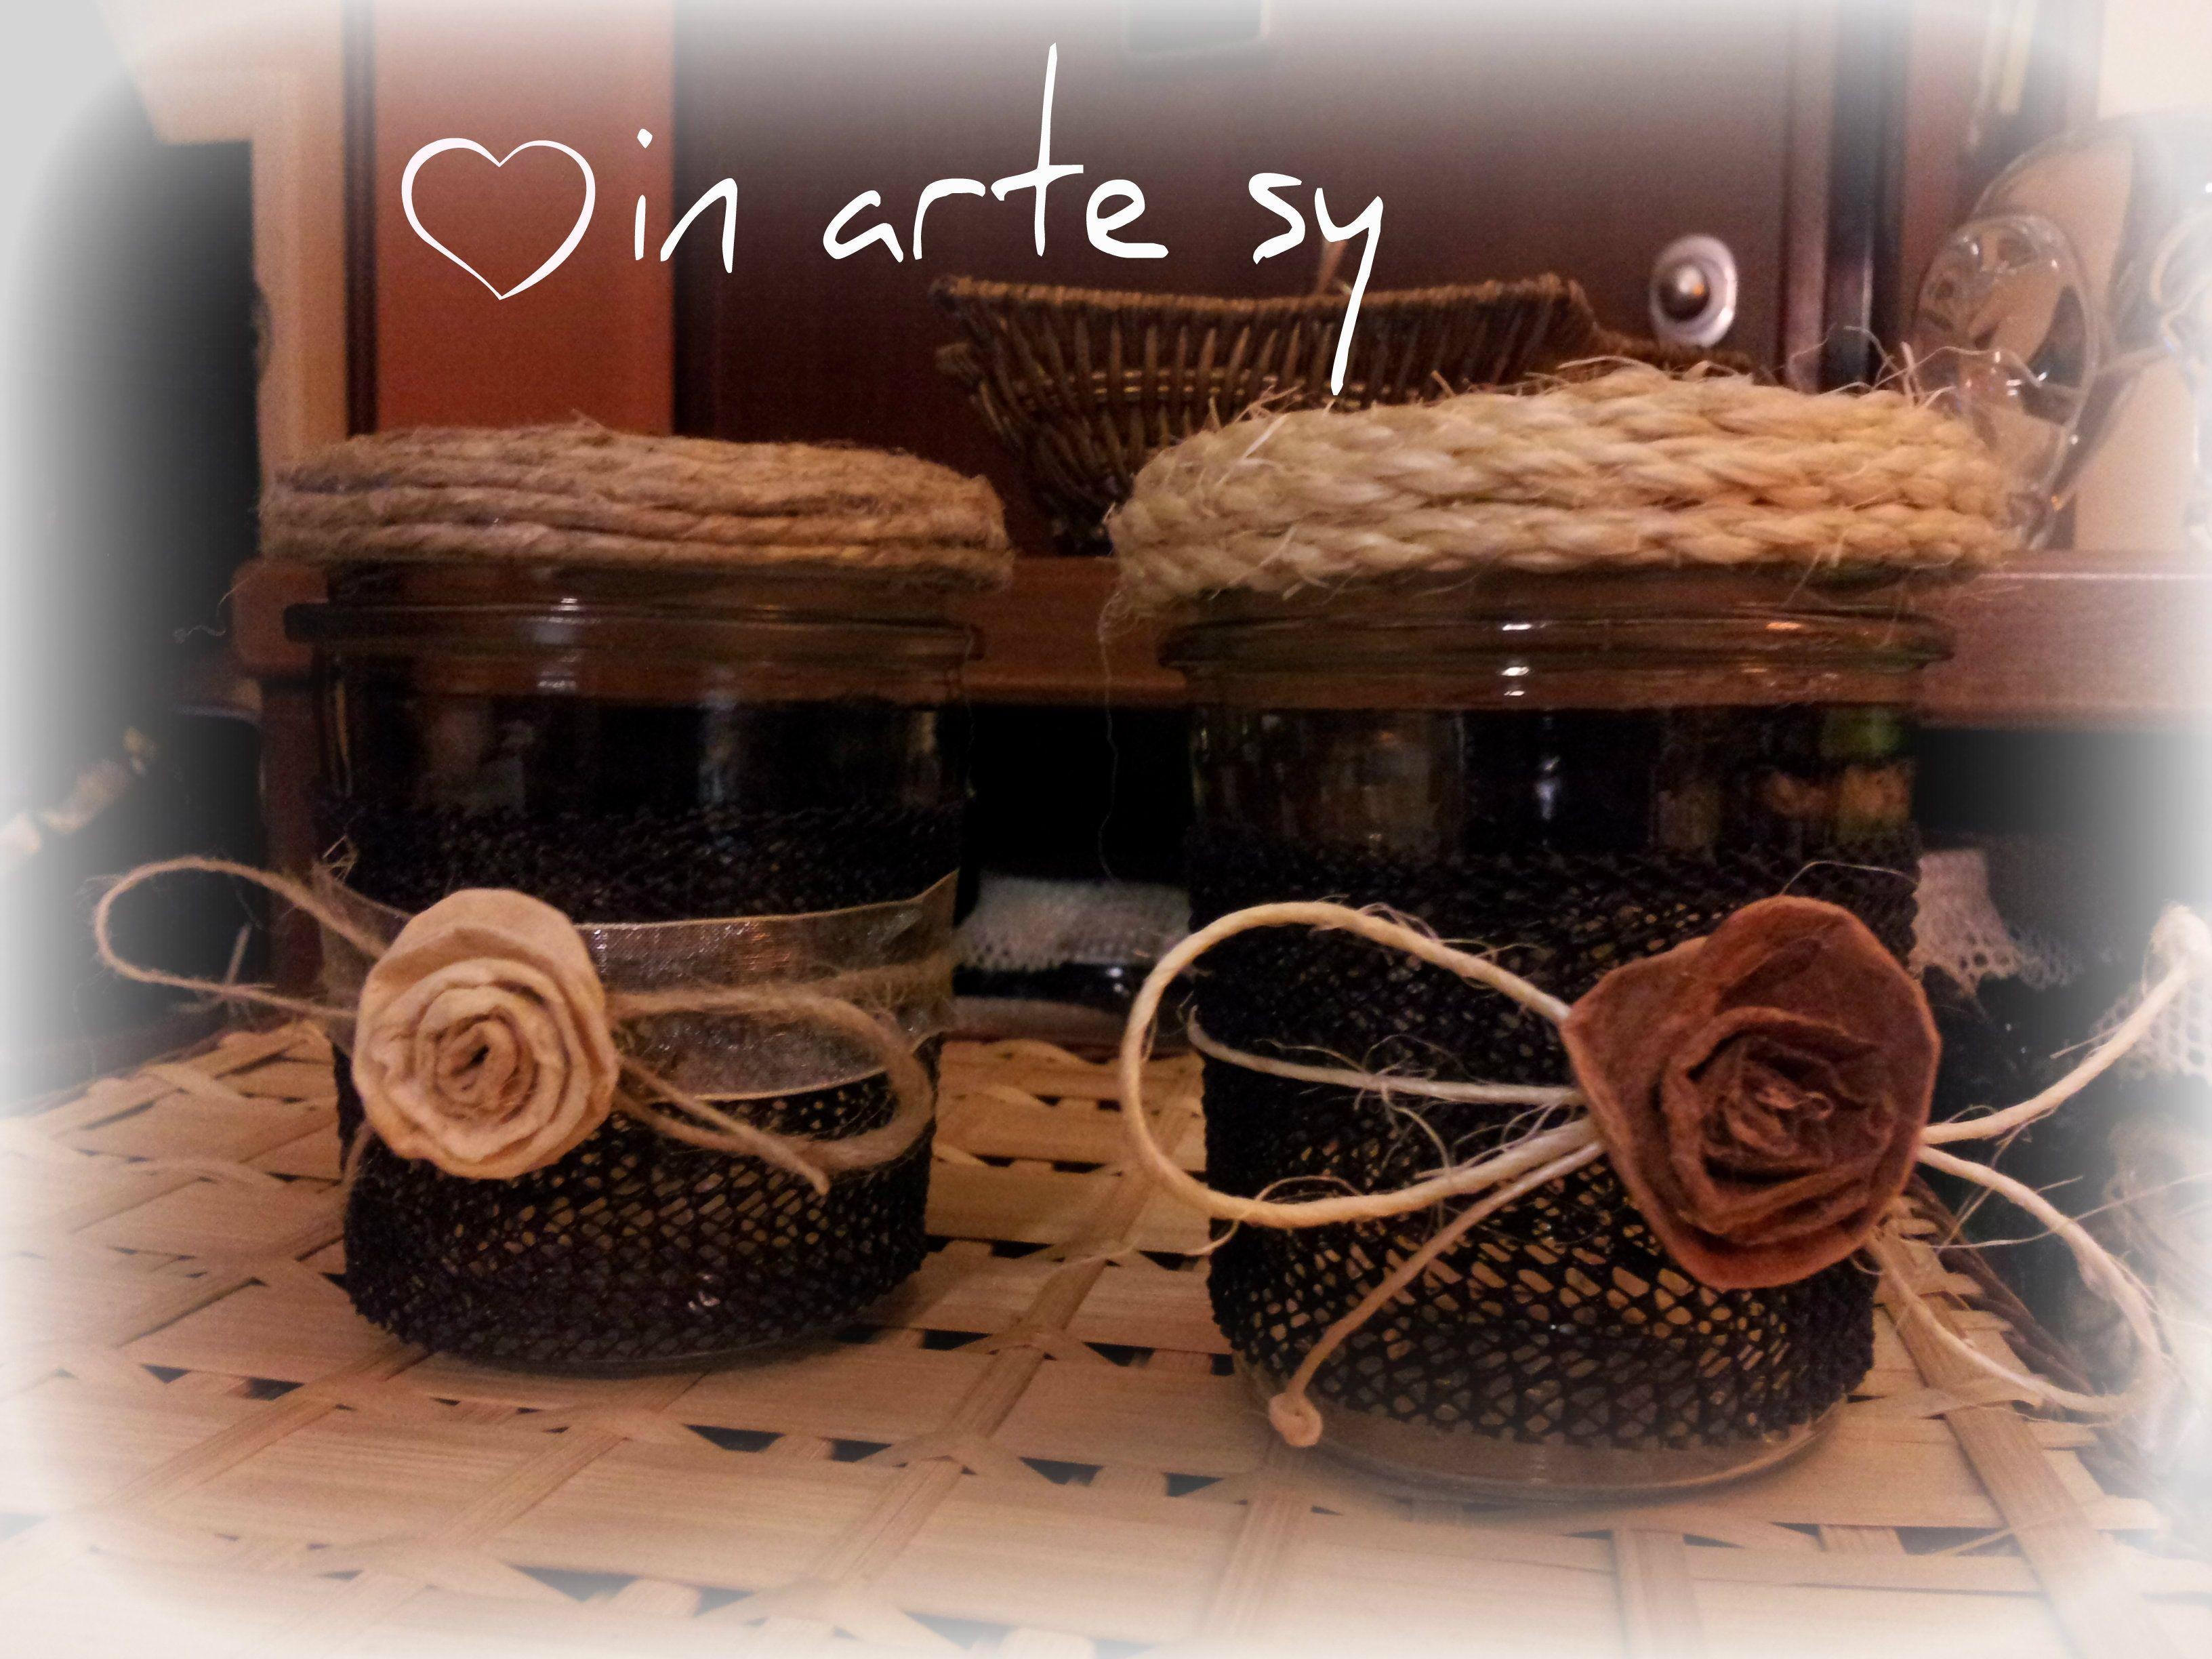 Barattoli porta tisane legumi o spezie decorati con spago e rose in finto feltro jars for teas - Porta tisane fai da te ...